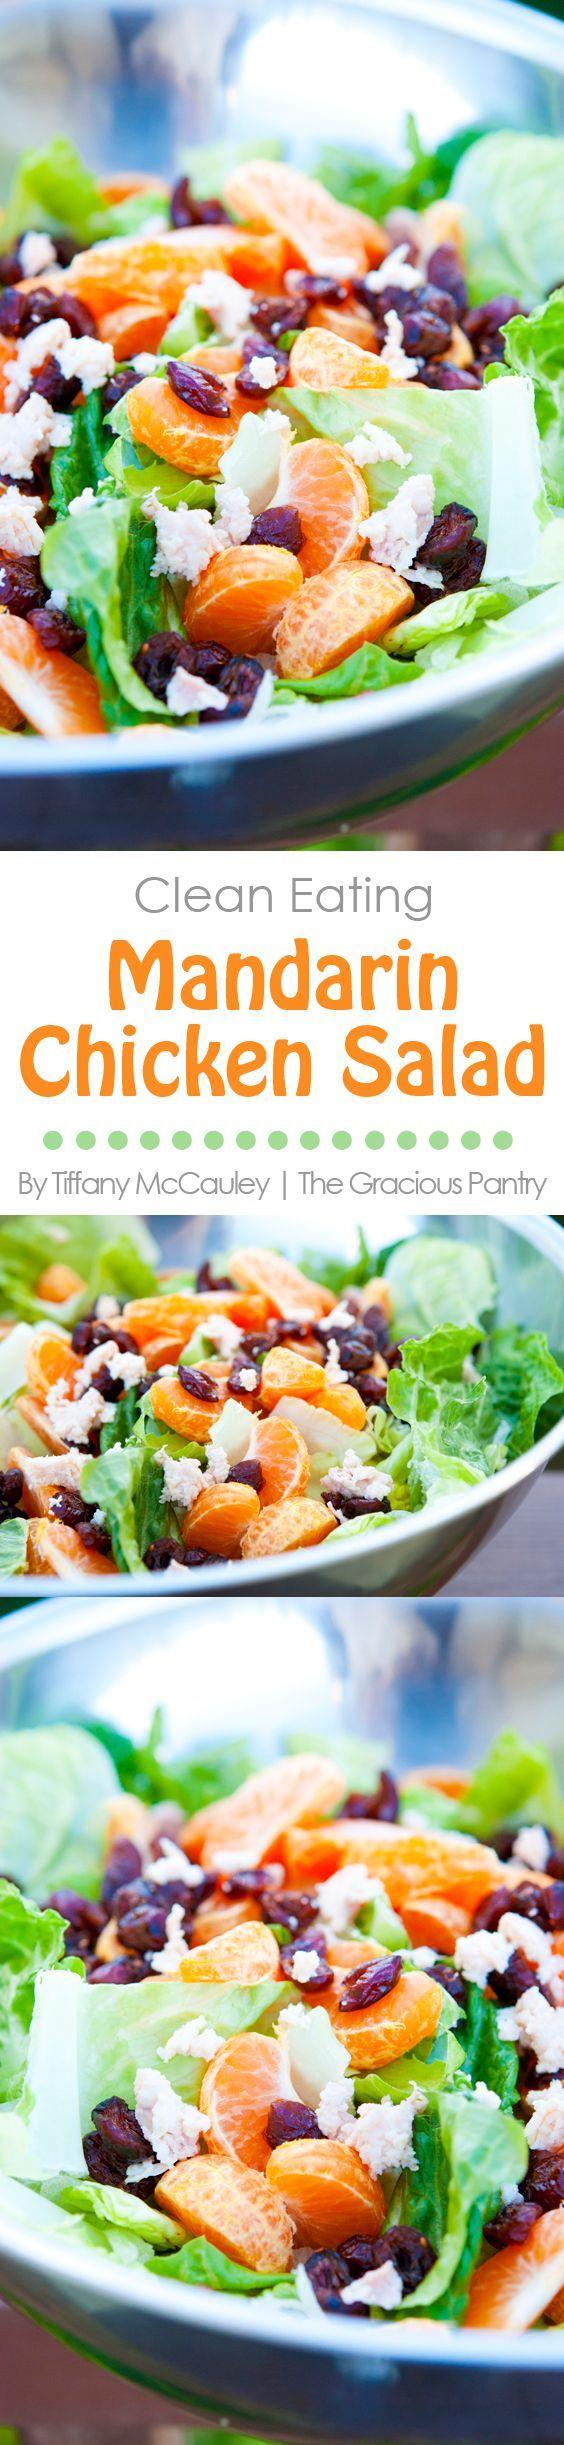 Clean Eating Recipes | Mandarin Chicken Salad | Salad Recipes ~ https://www.thegraciouspantry.com